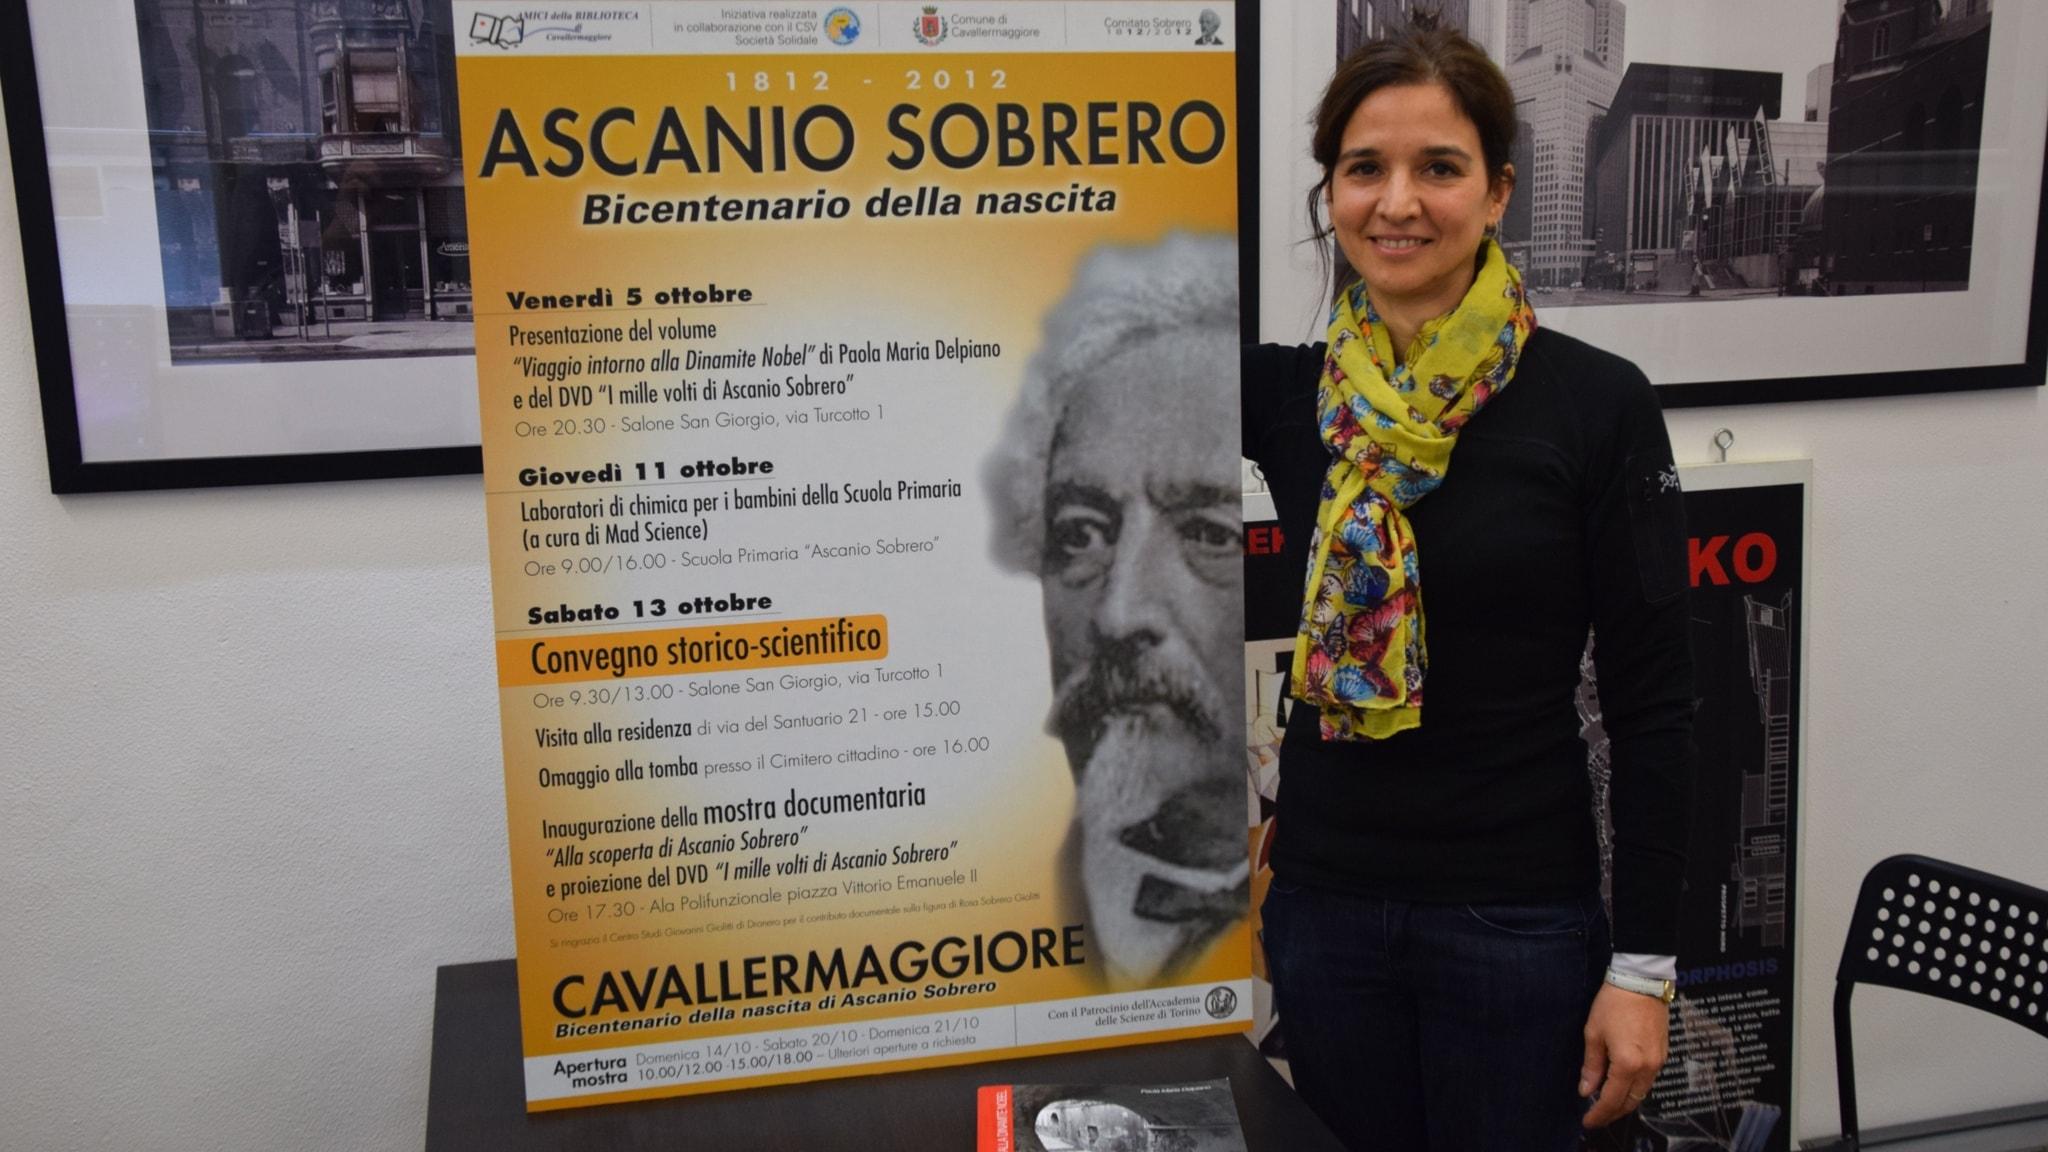 Paola Maria Delpiano framför en affisch